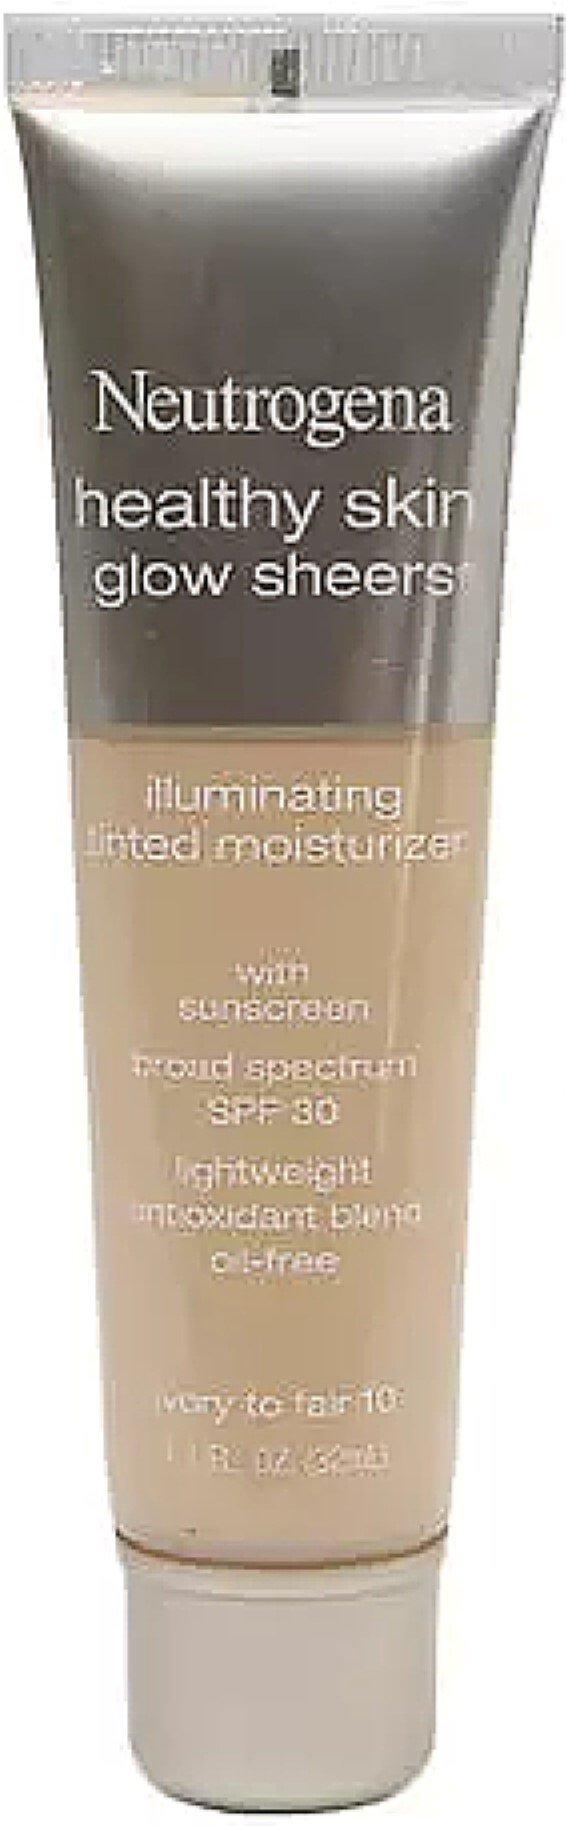 Neutrogena Healthy Skin Glow Sheers, SPF 30, Ivory to Fair [10] 1.1 oz (8 Pack)